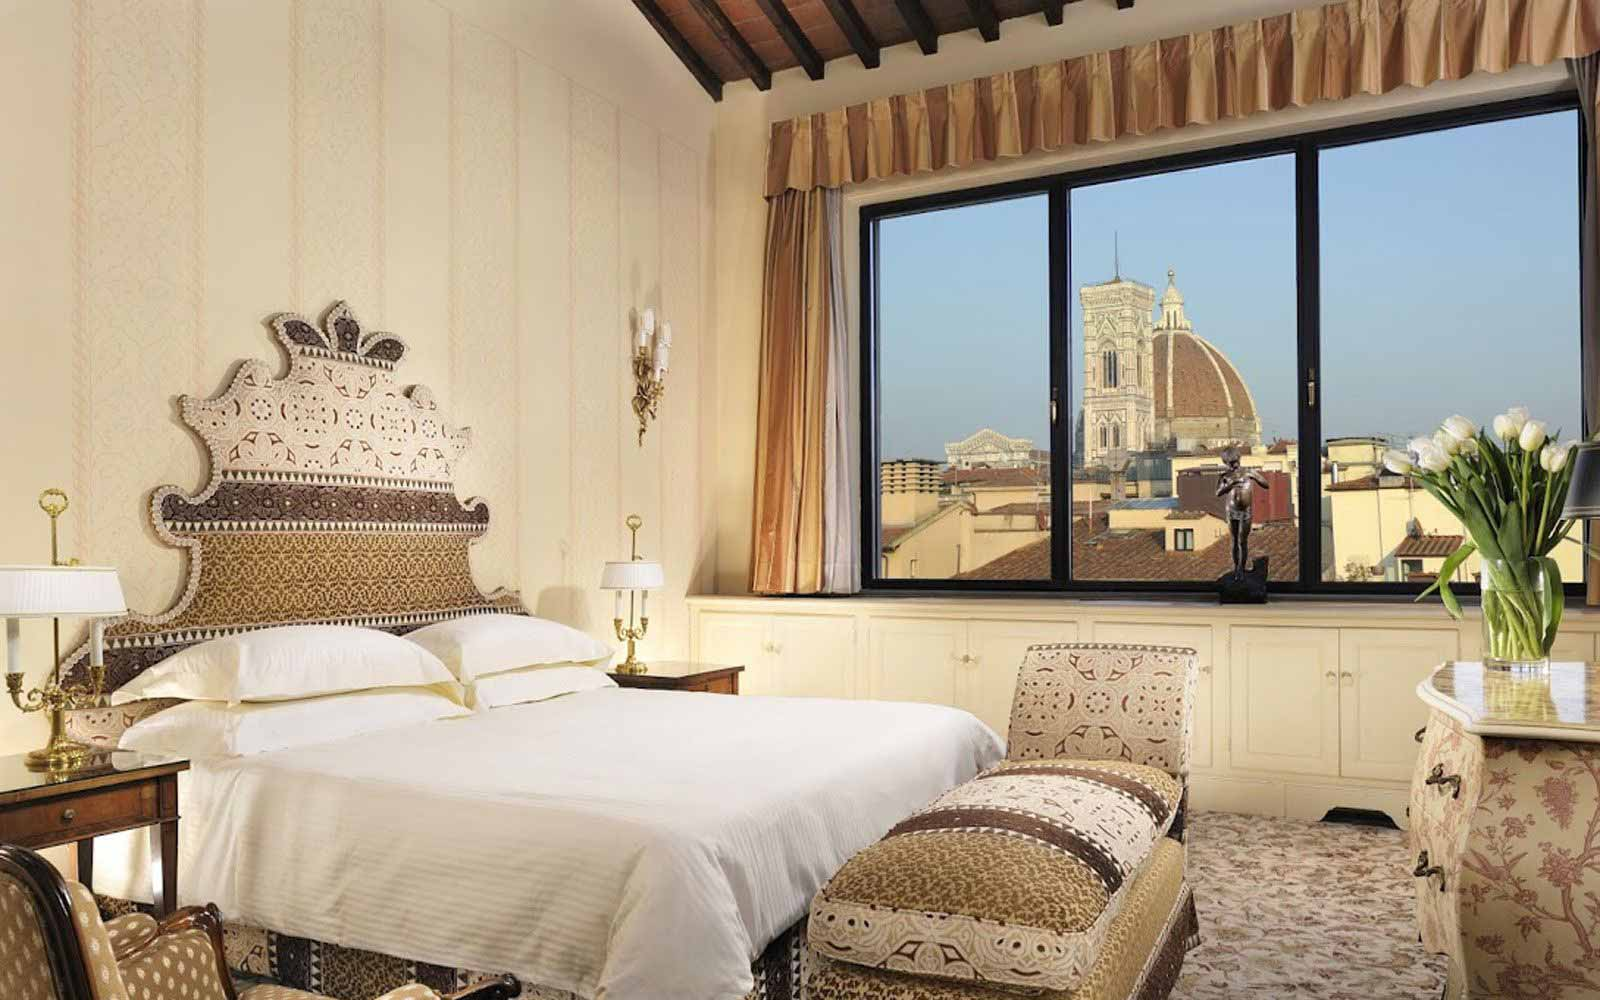 Royal suite at Hotel Helvetia & Bristol